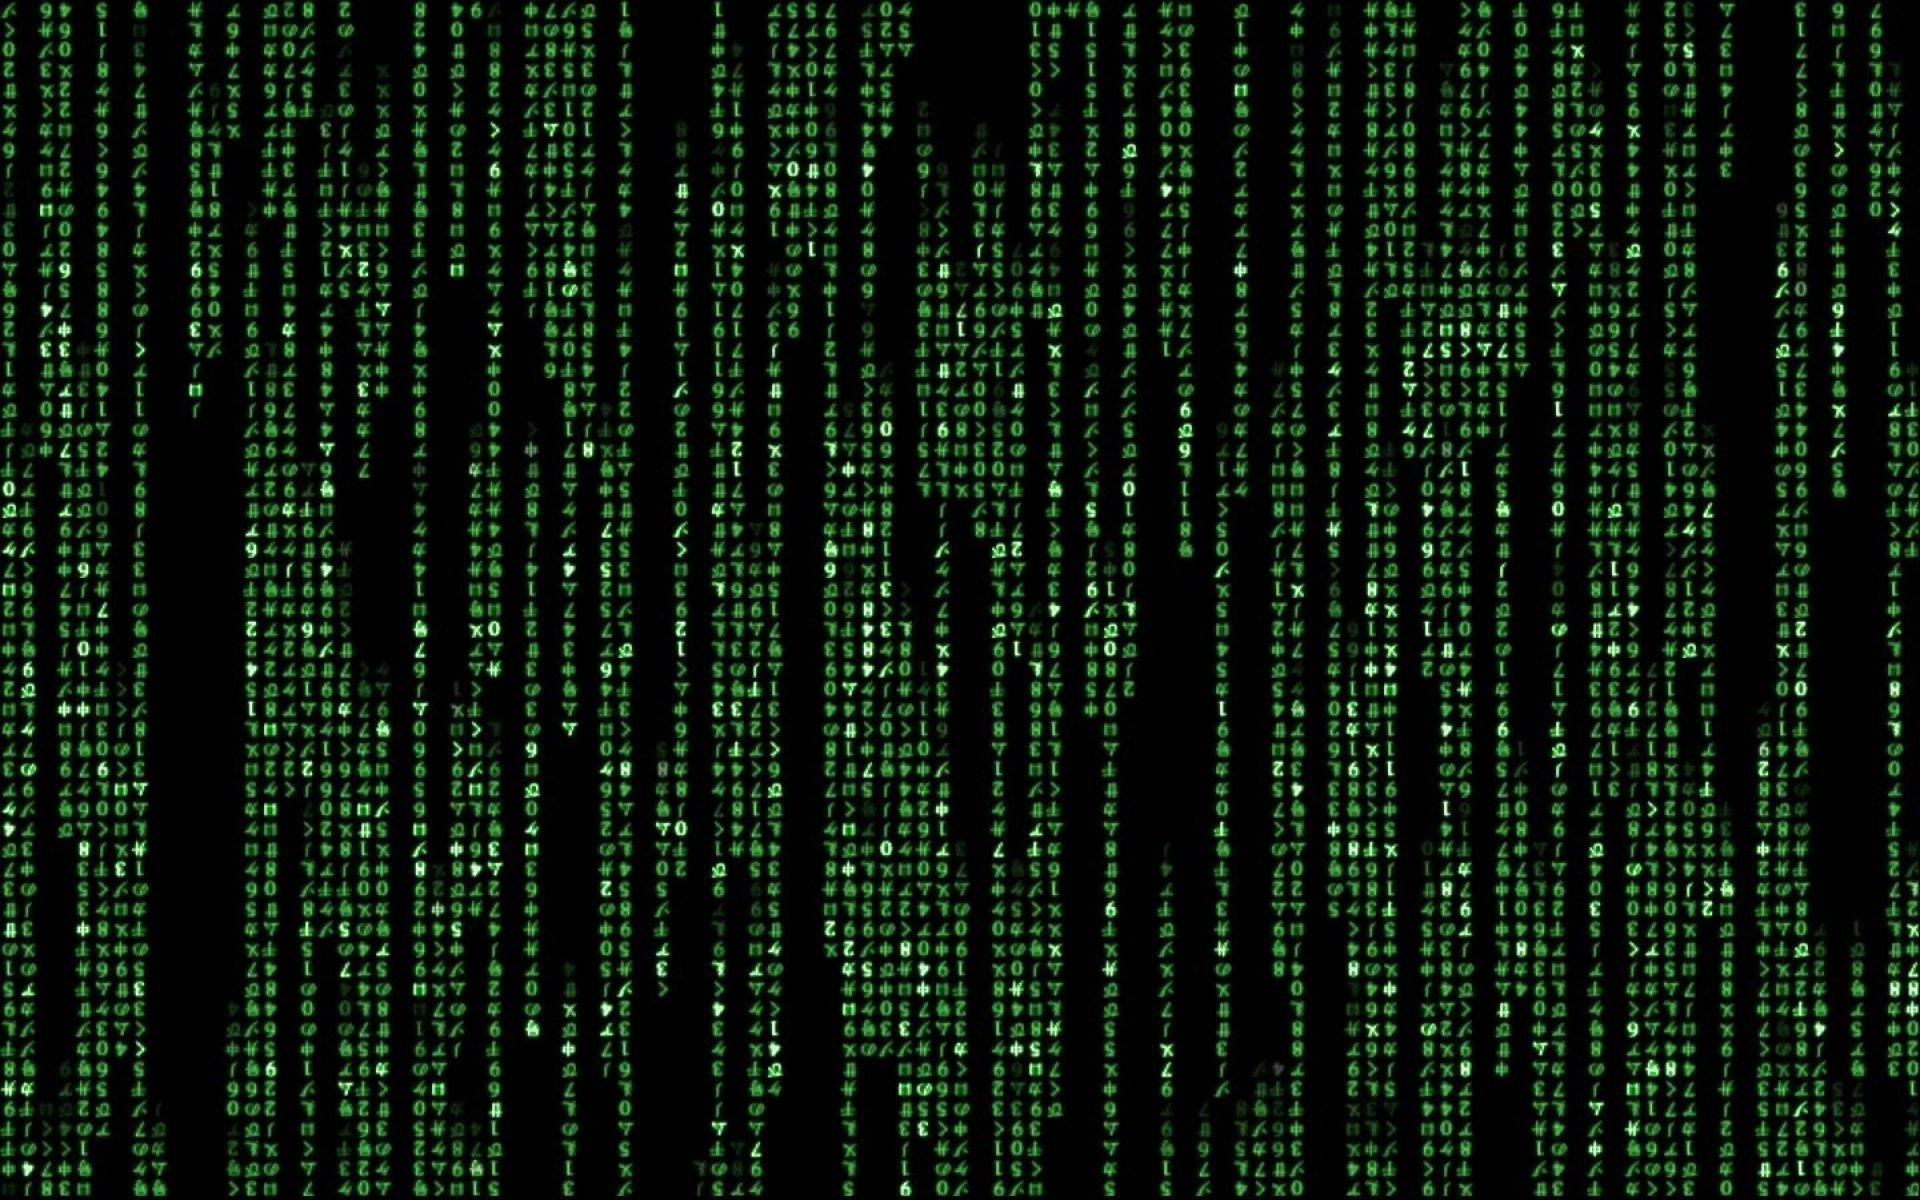 Matrix Wallpaper Animated Wallpapers In 2019 Wallpaper Movie